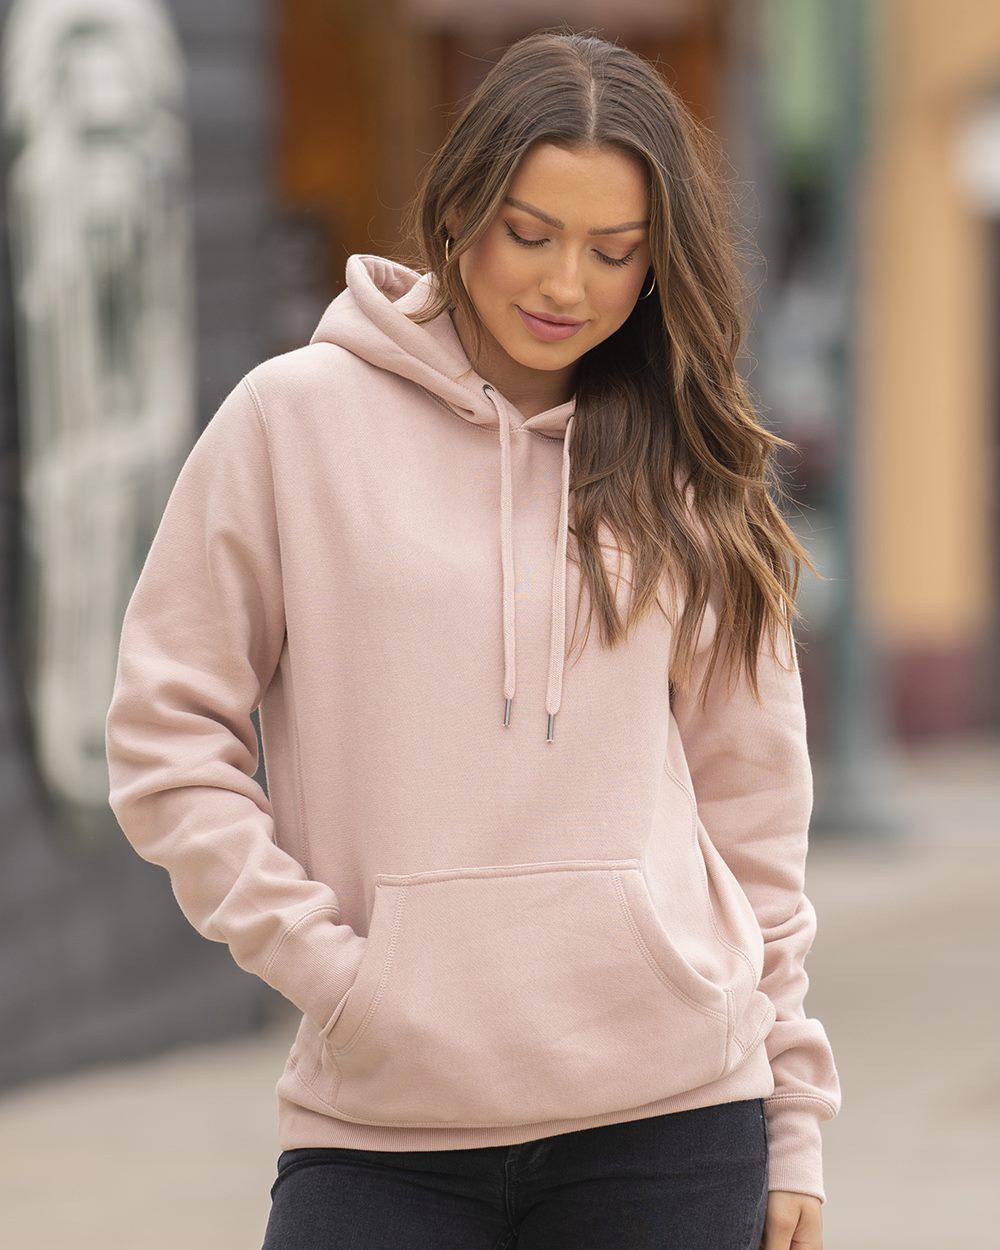 Independent Trading Co. IND5000P - Unisex Premium Heavyweight Cross-Grain Hooded Sweatshirt